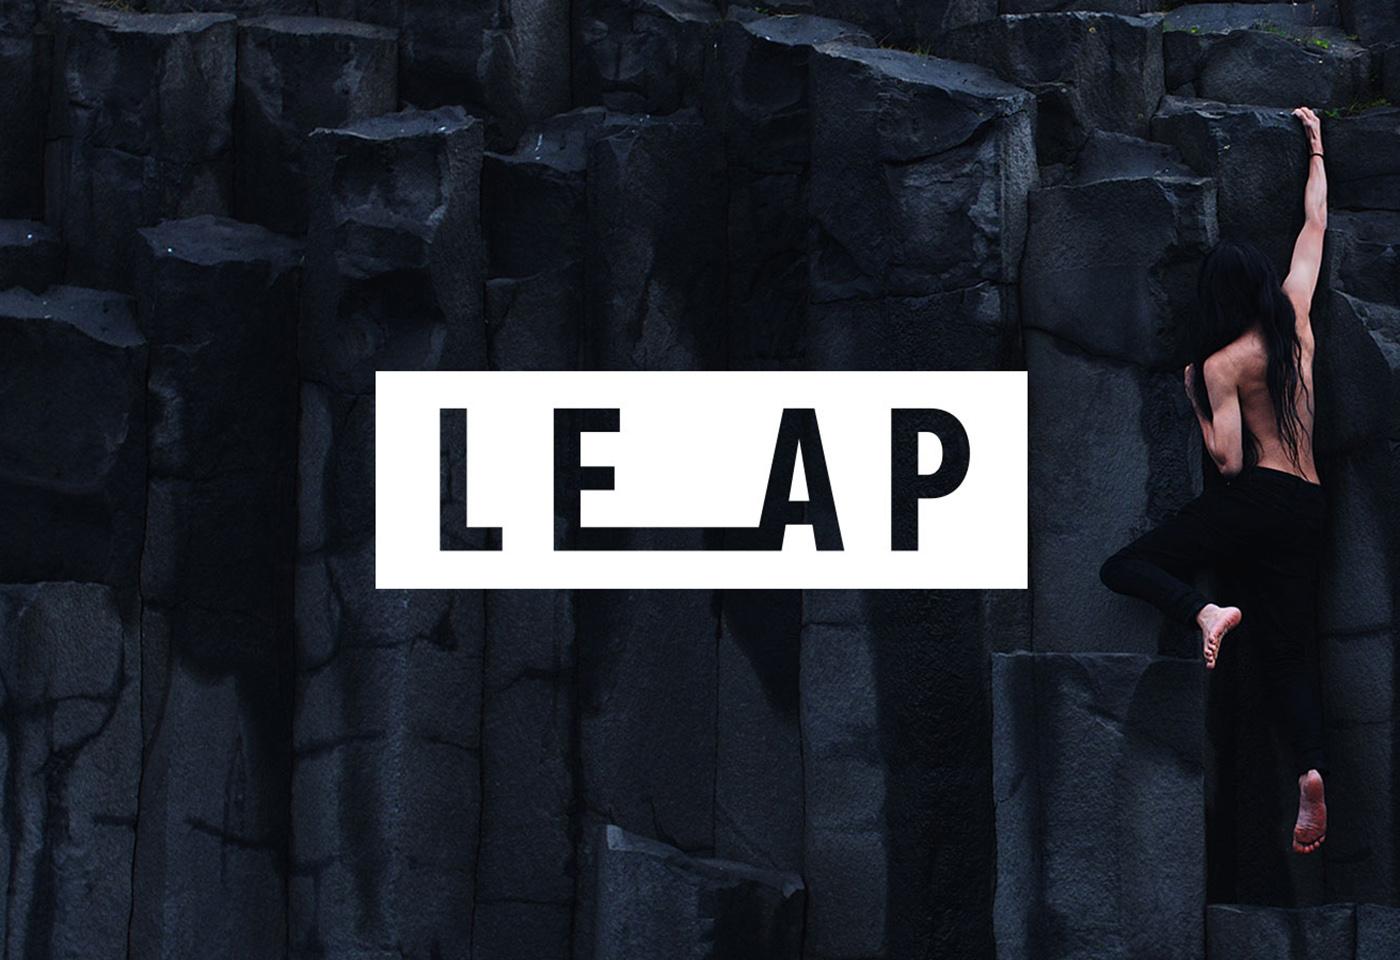 Man climbing mountain for LEAP by Jarrad Seng